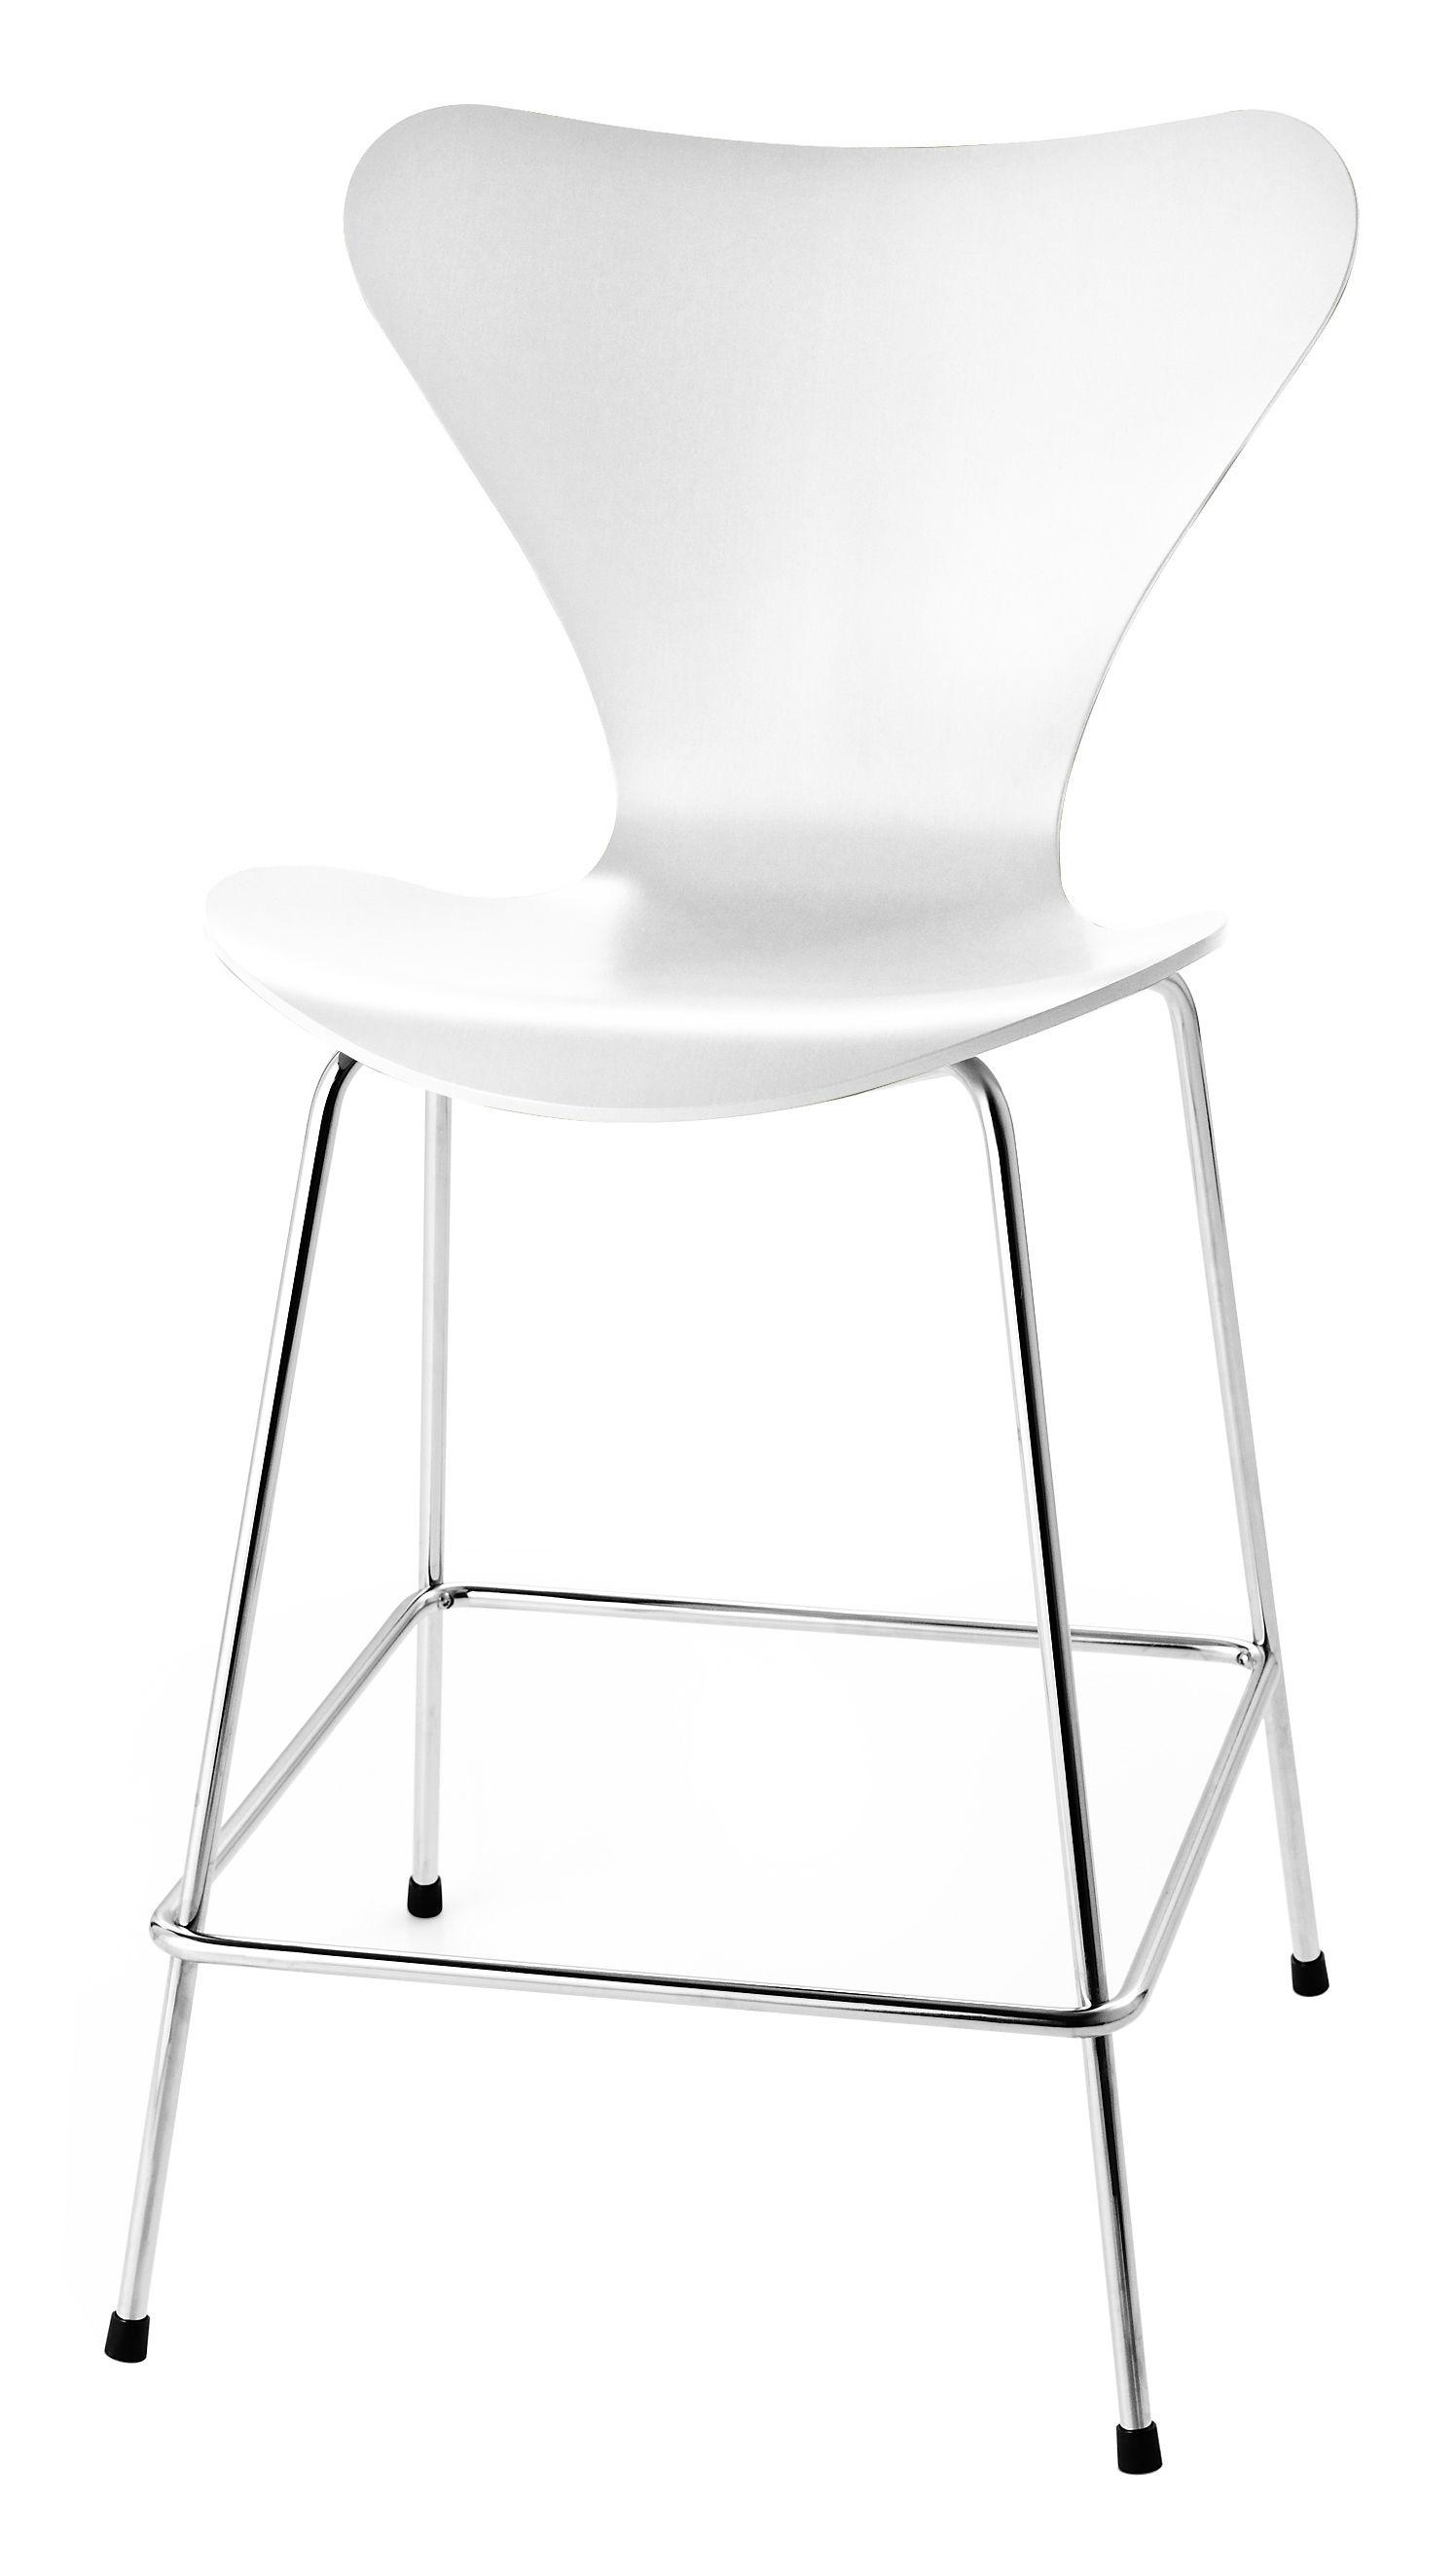 Furniture - Bar Stools - Série 7 Bar chair - H 76 cm - Stainded ash by Fritz Hansen - White - Ashwood, Chromed steel